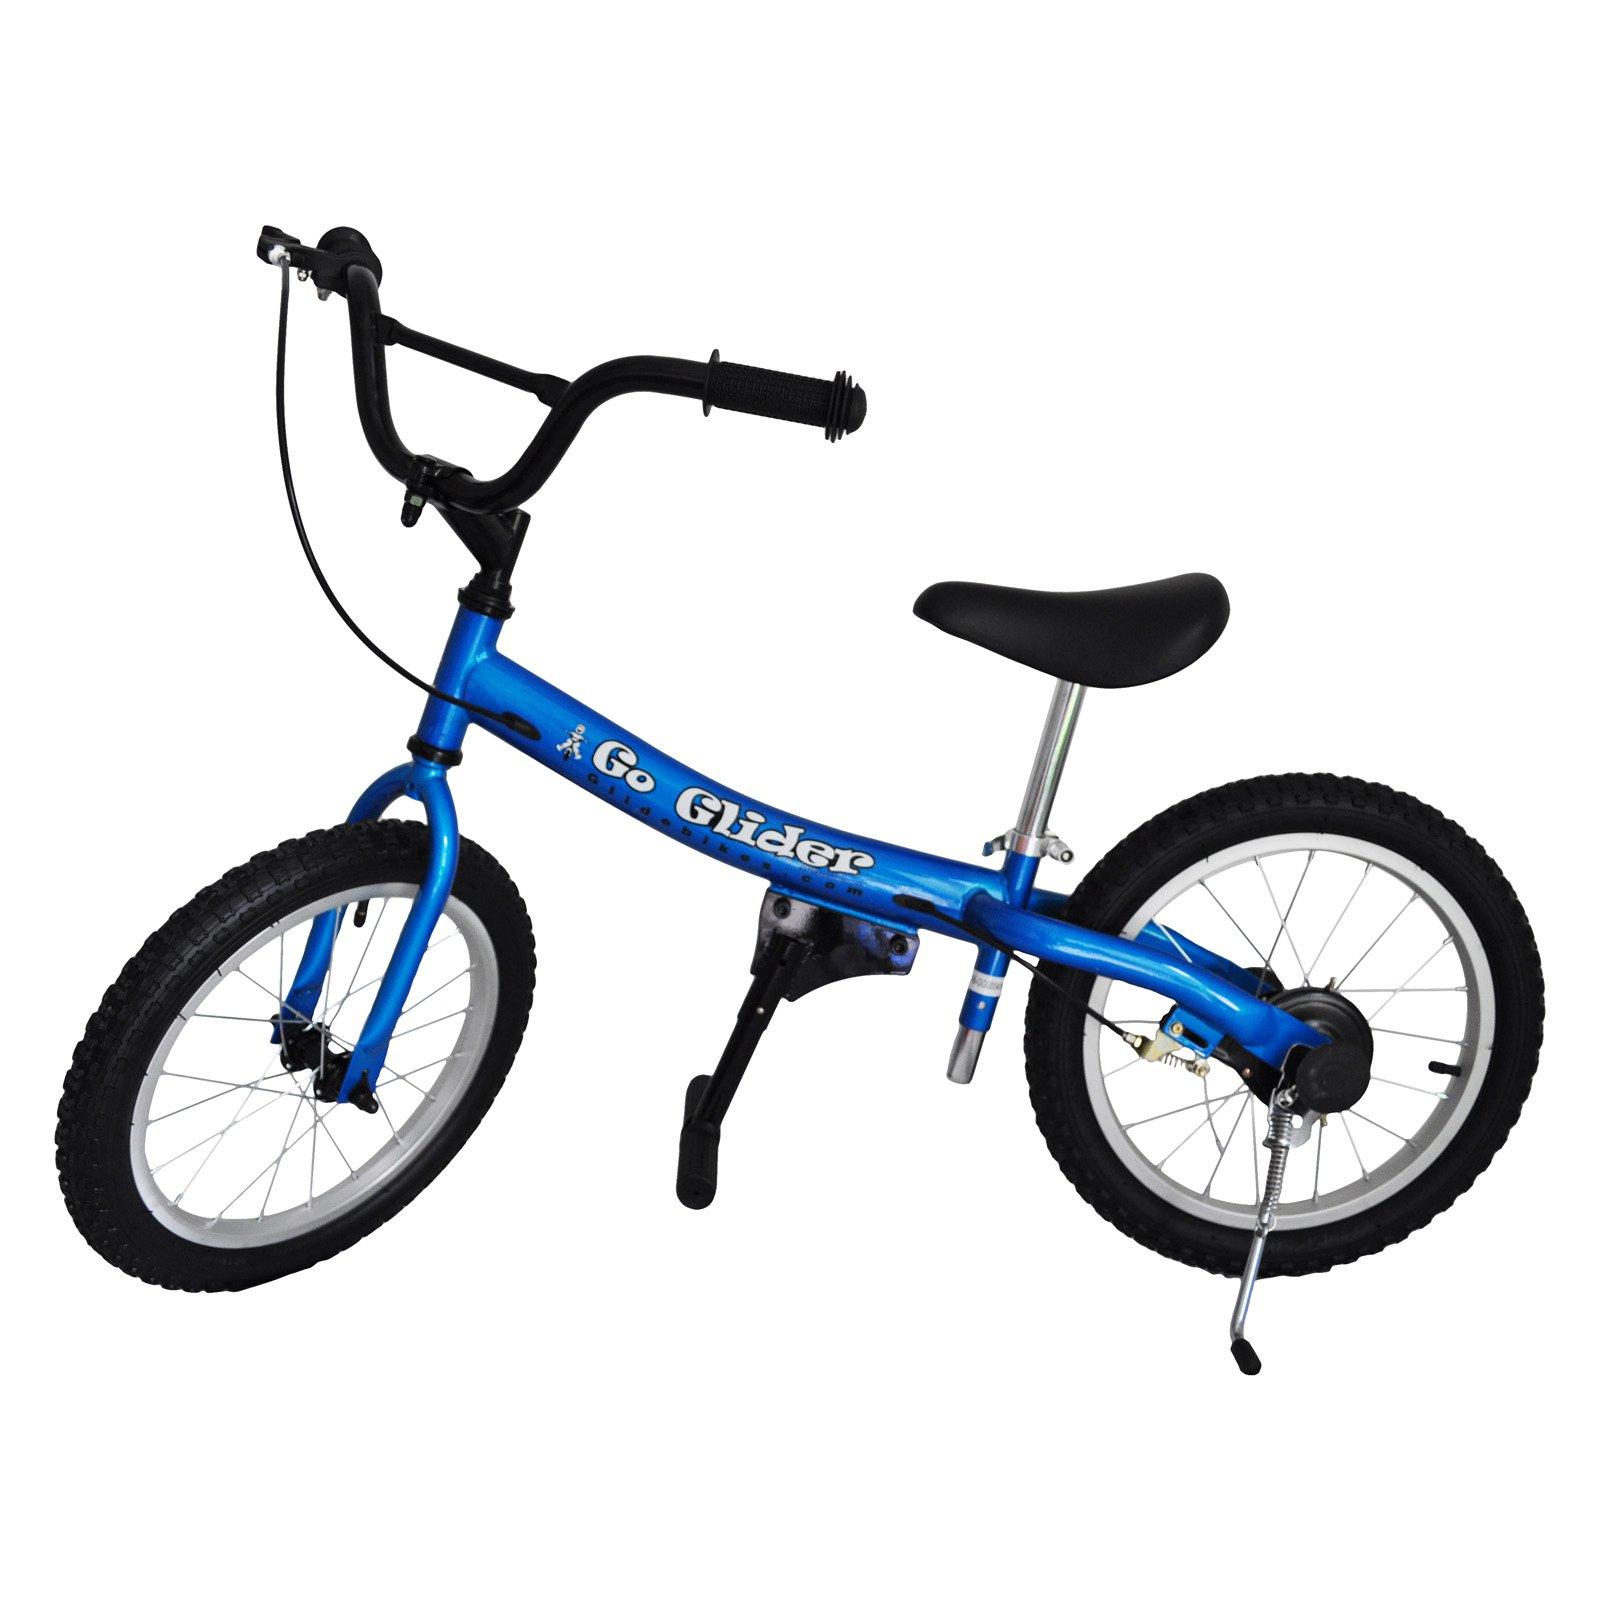 Glide Bikes 16 in. Go Glider Balance Bike - Blue